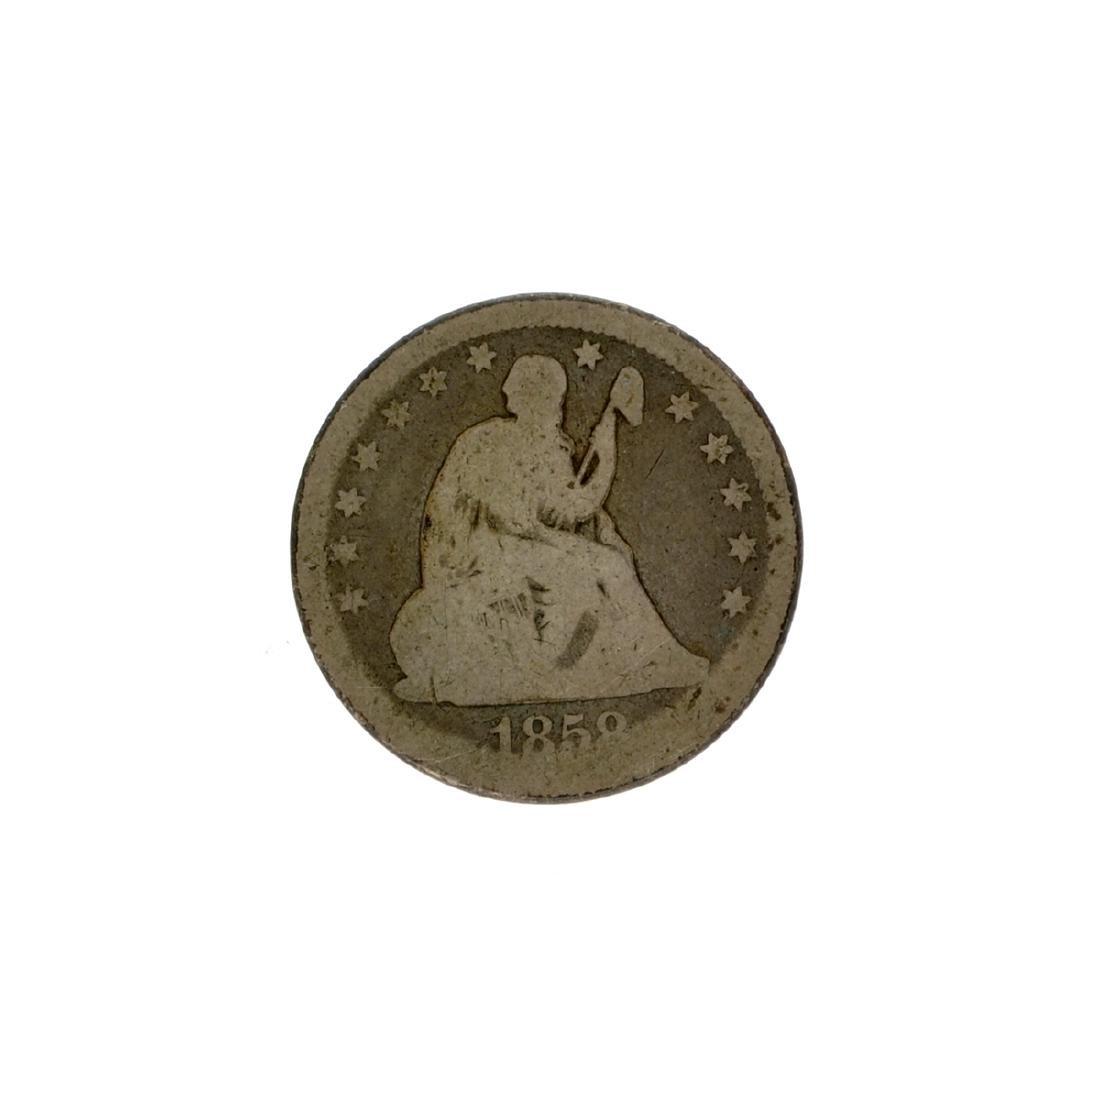 1858 Liberty Seated Quarter Dollar Coin